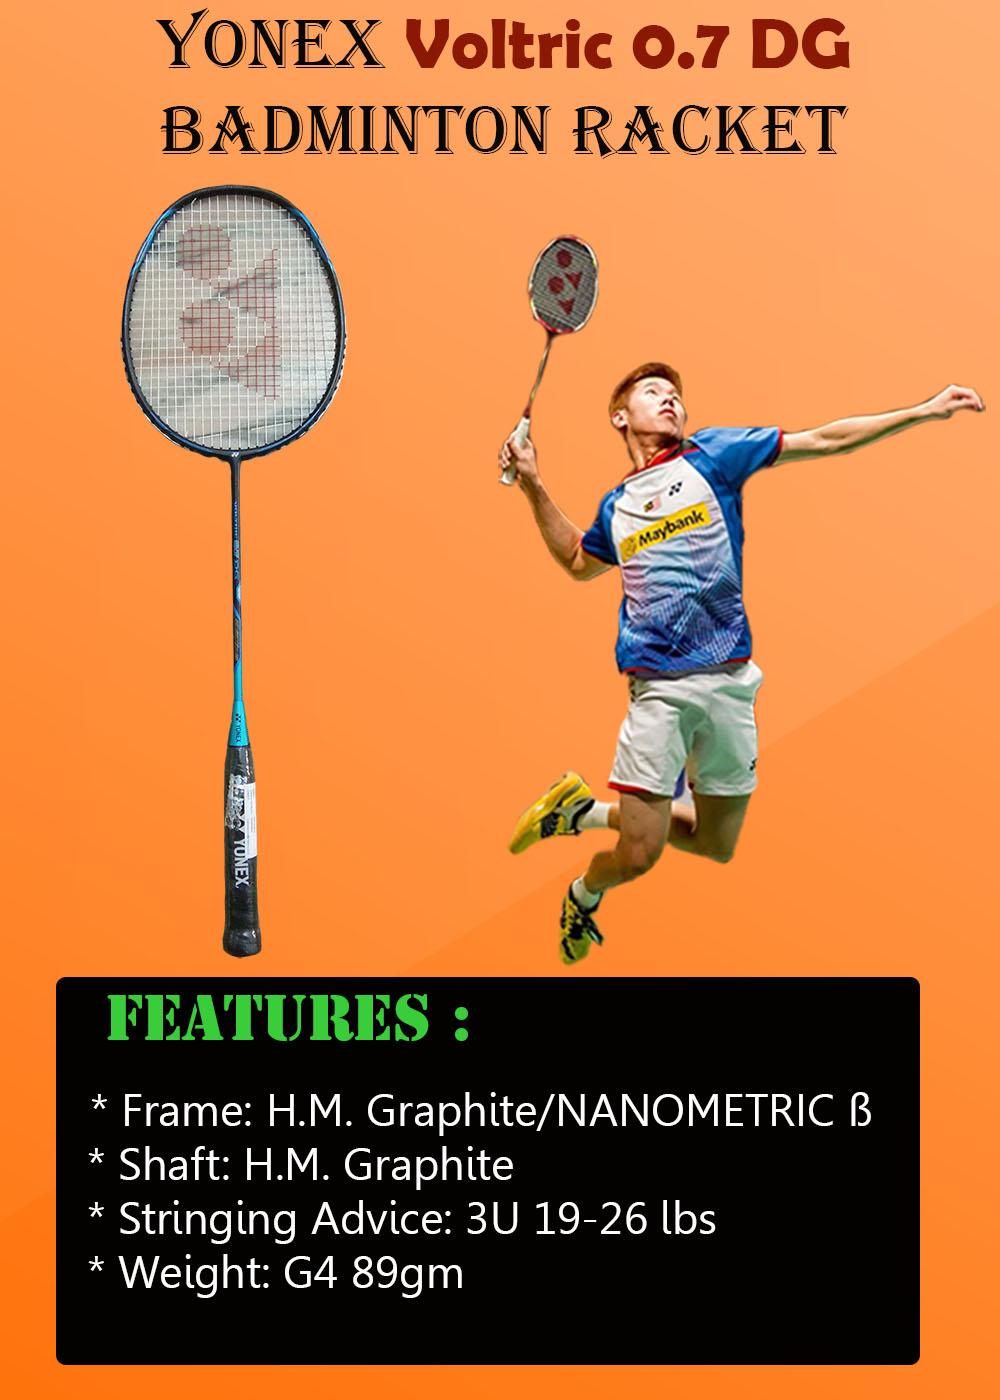 Yonex Voltric 0 7 DG Badminton Racket